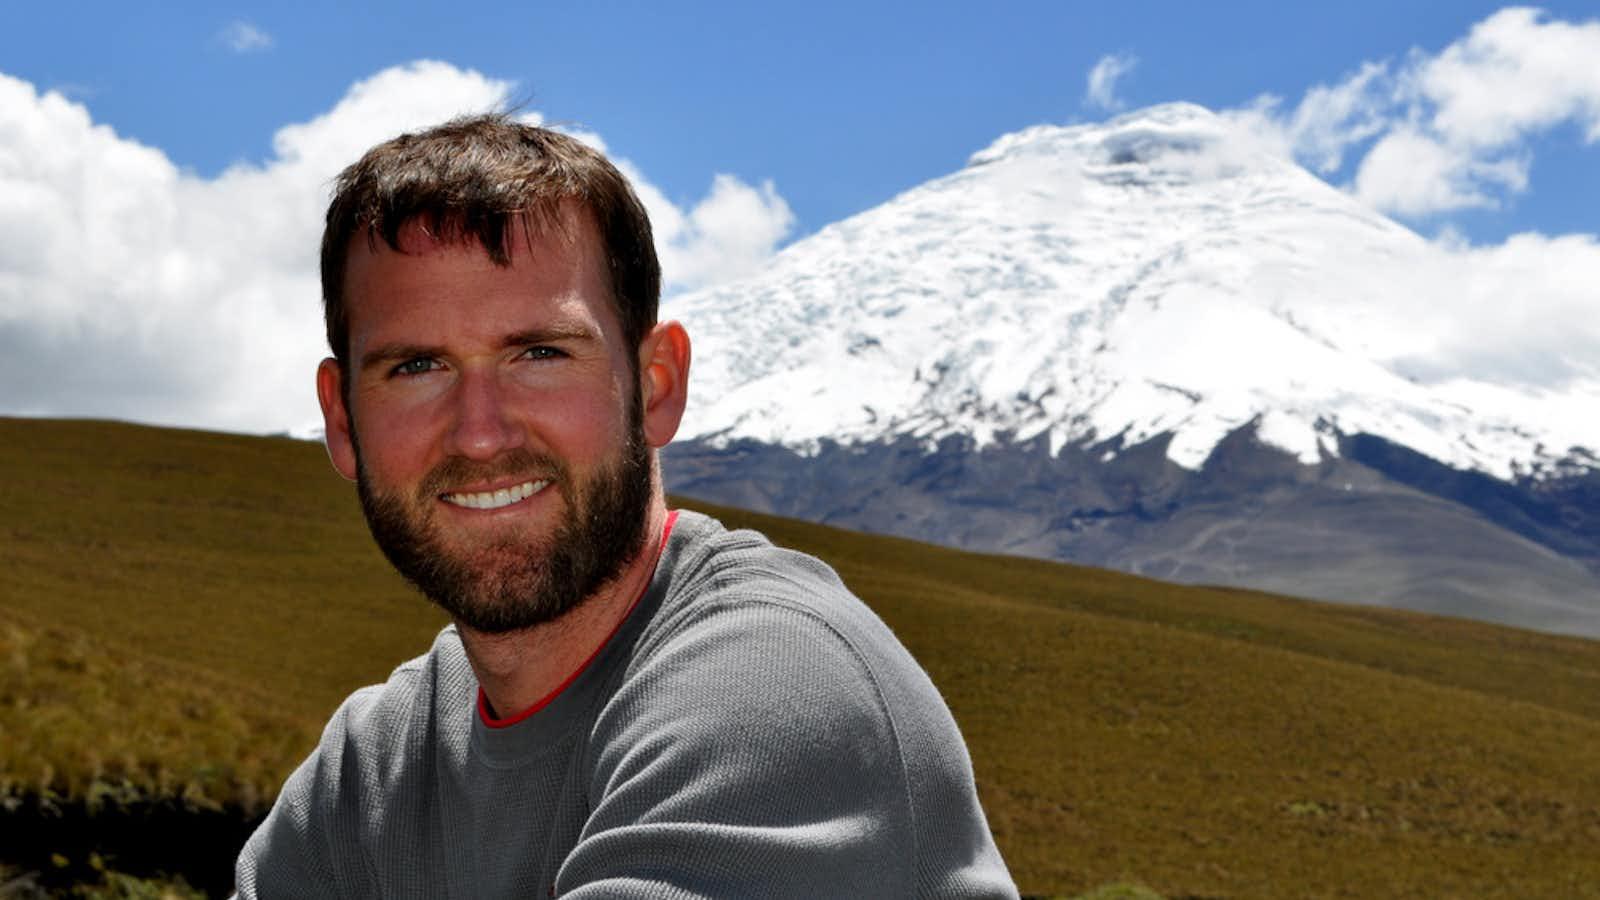 Robbie in Ecuador